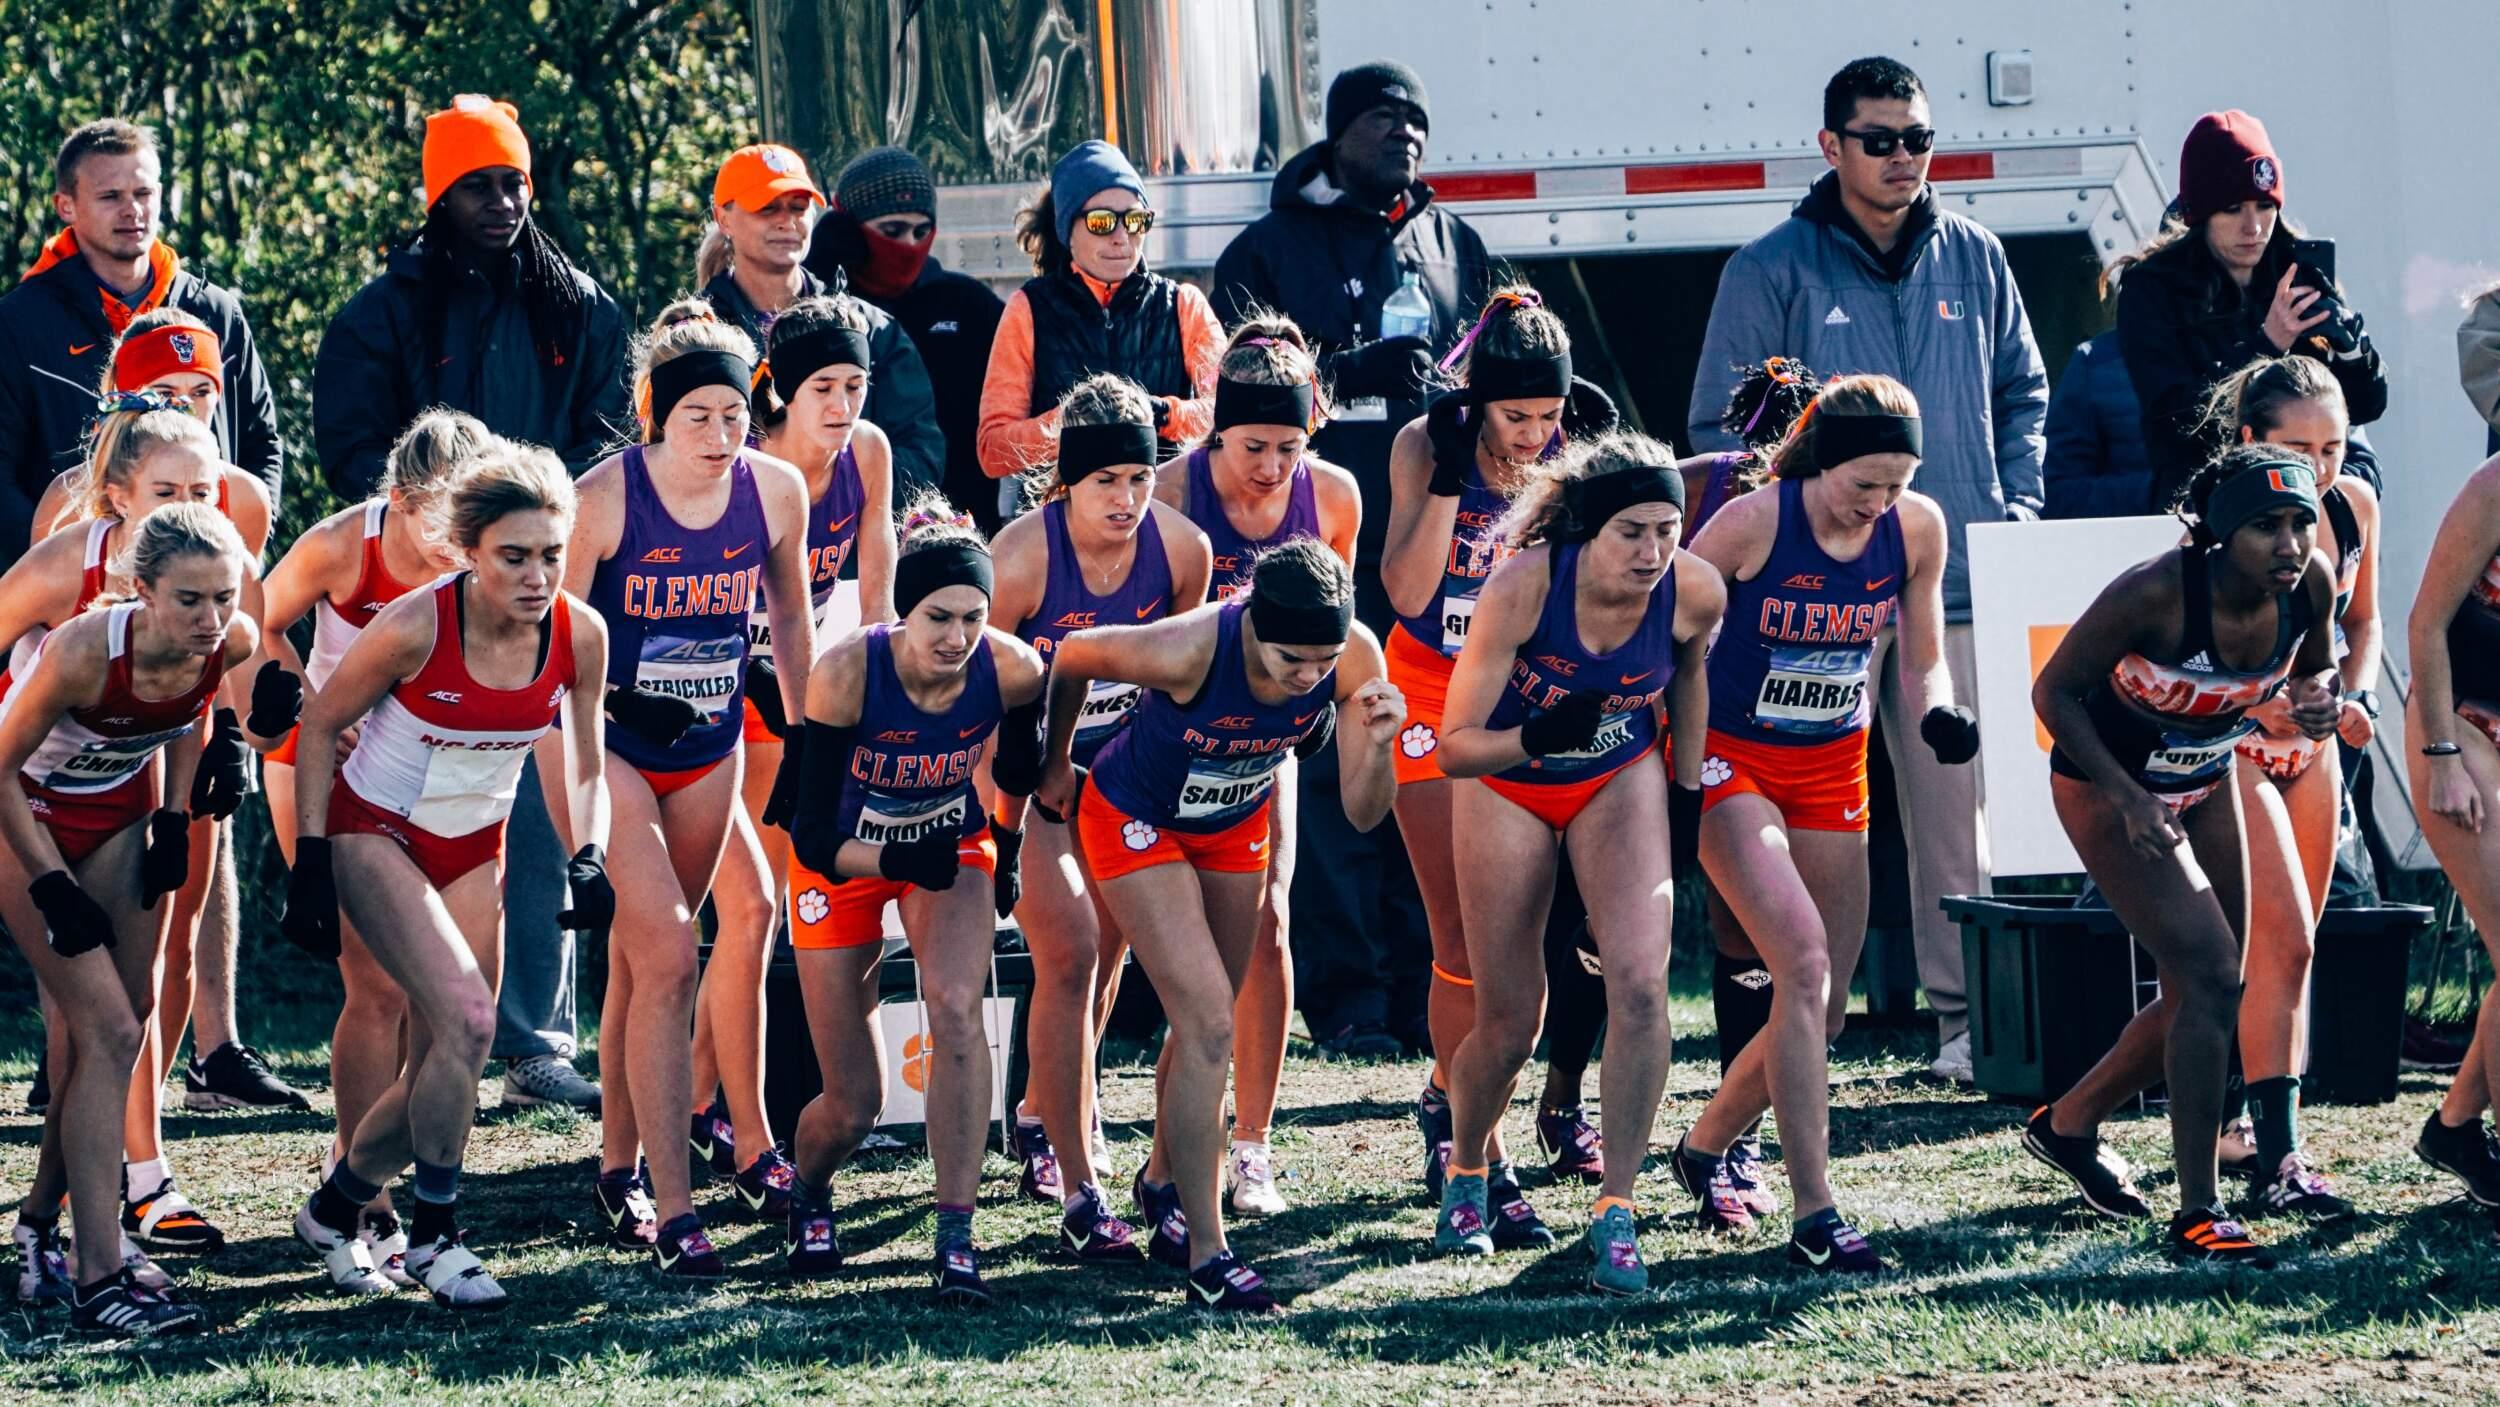 Clemson Tigers   Clemson University Athletics   Cross Country